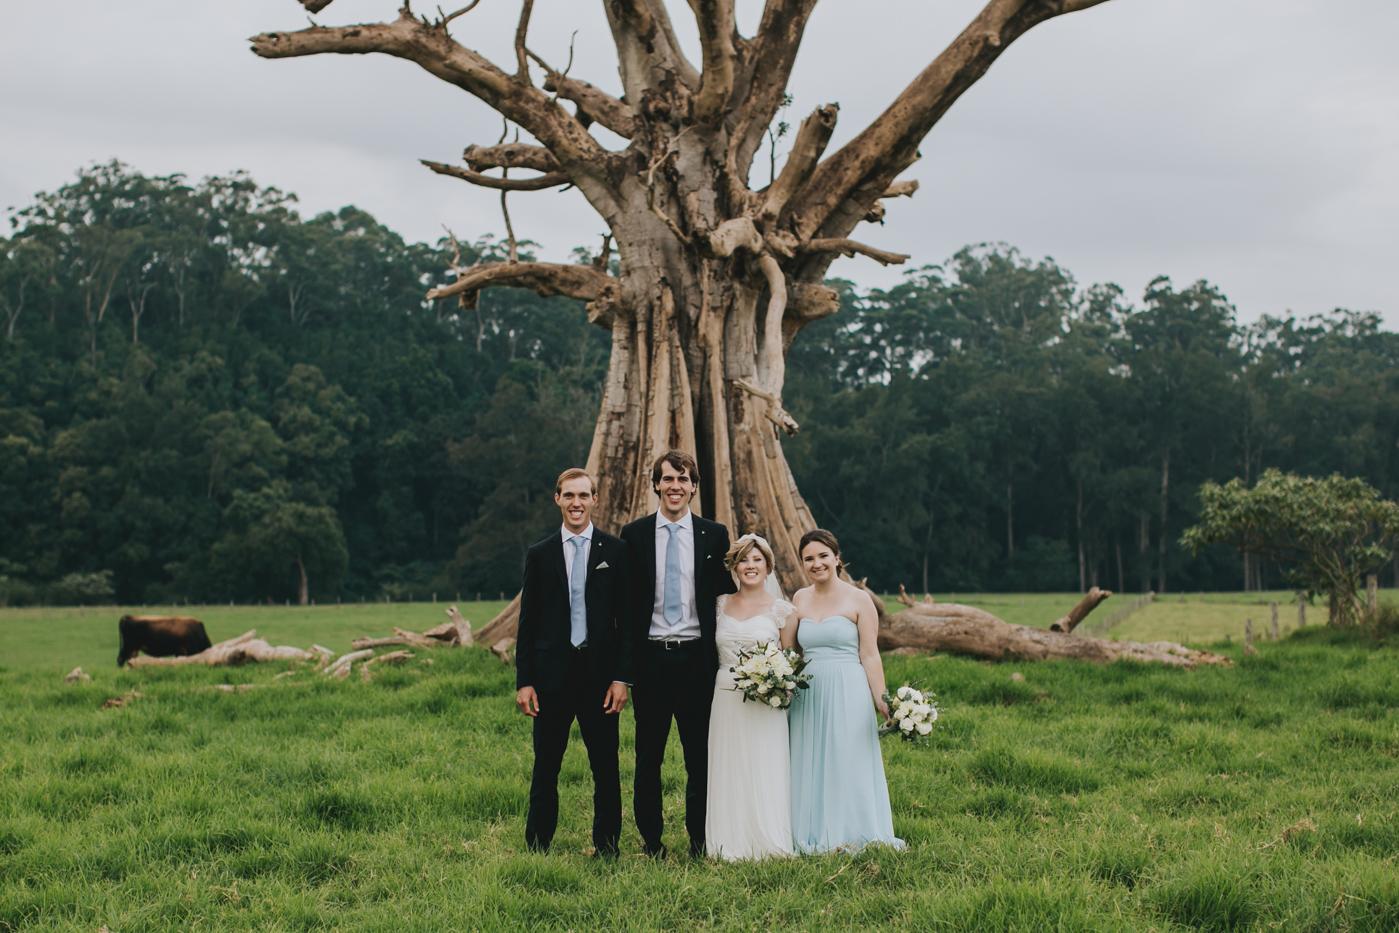 Rachel & Jacob - Willow Farm Berry - South Coast Wedding - Samantha Heather Photography-103.jpg